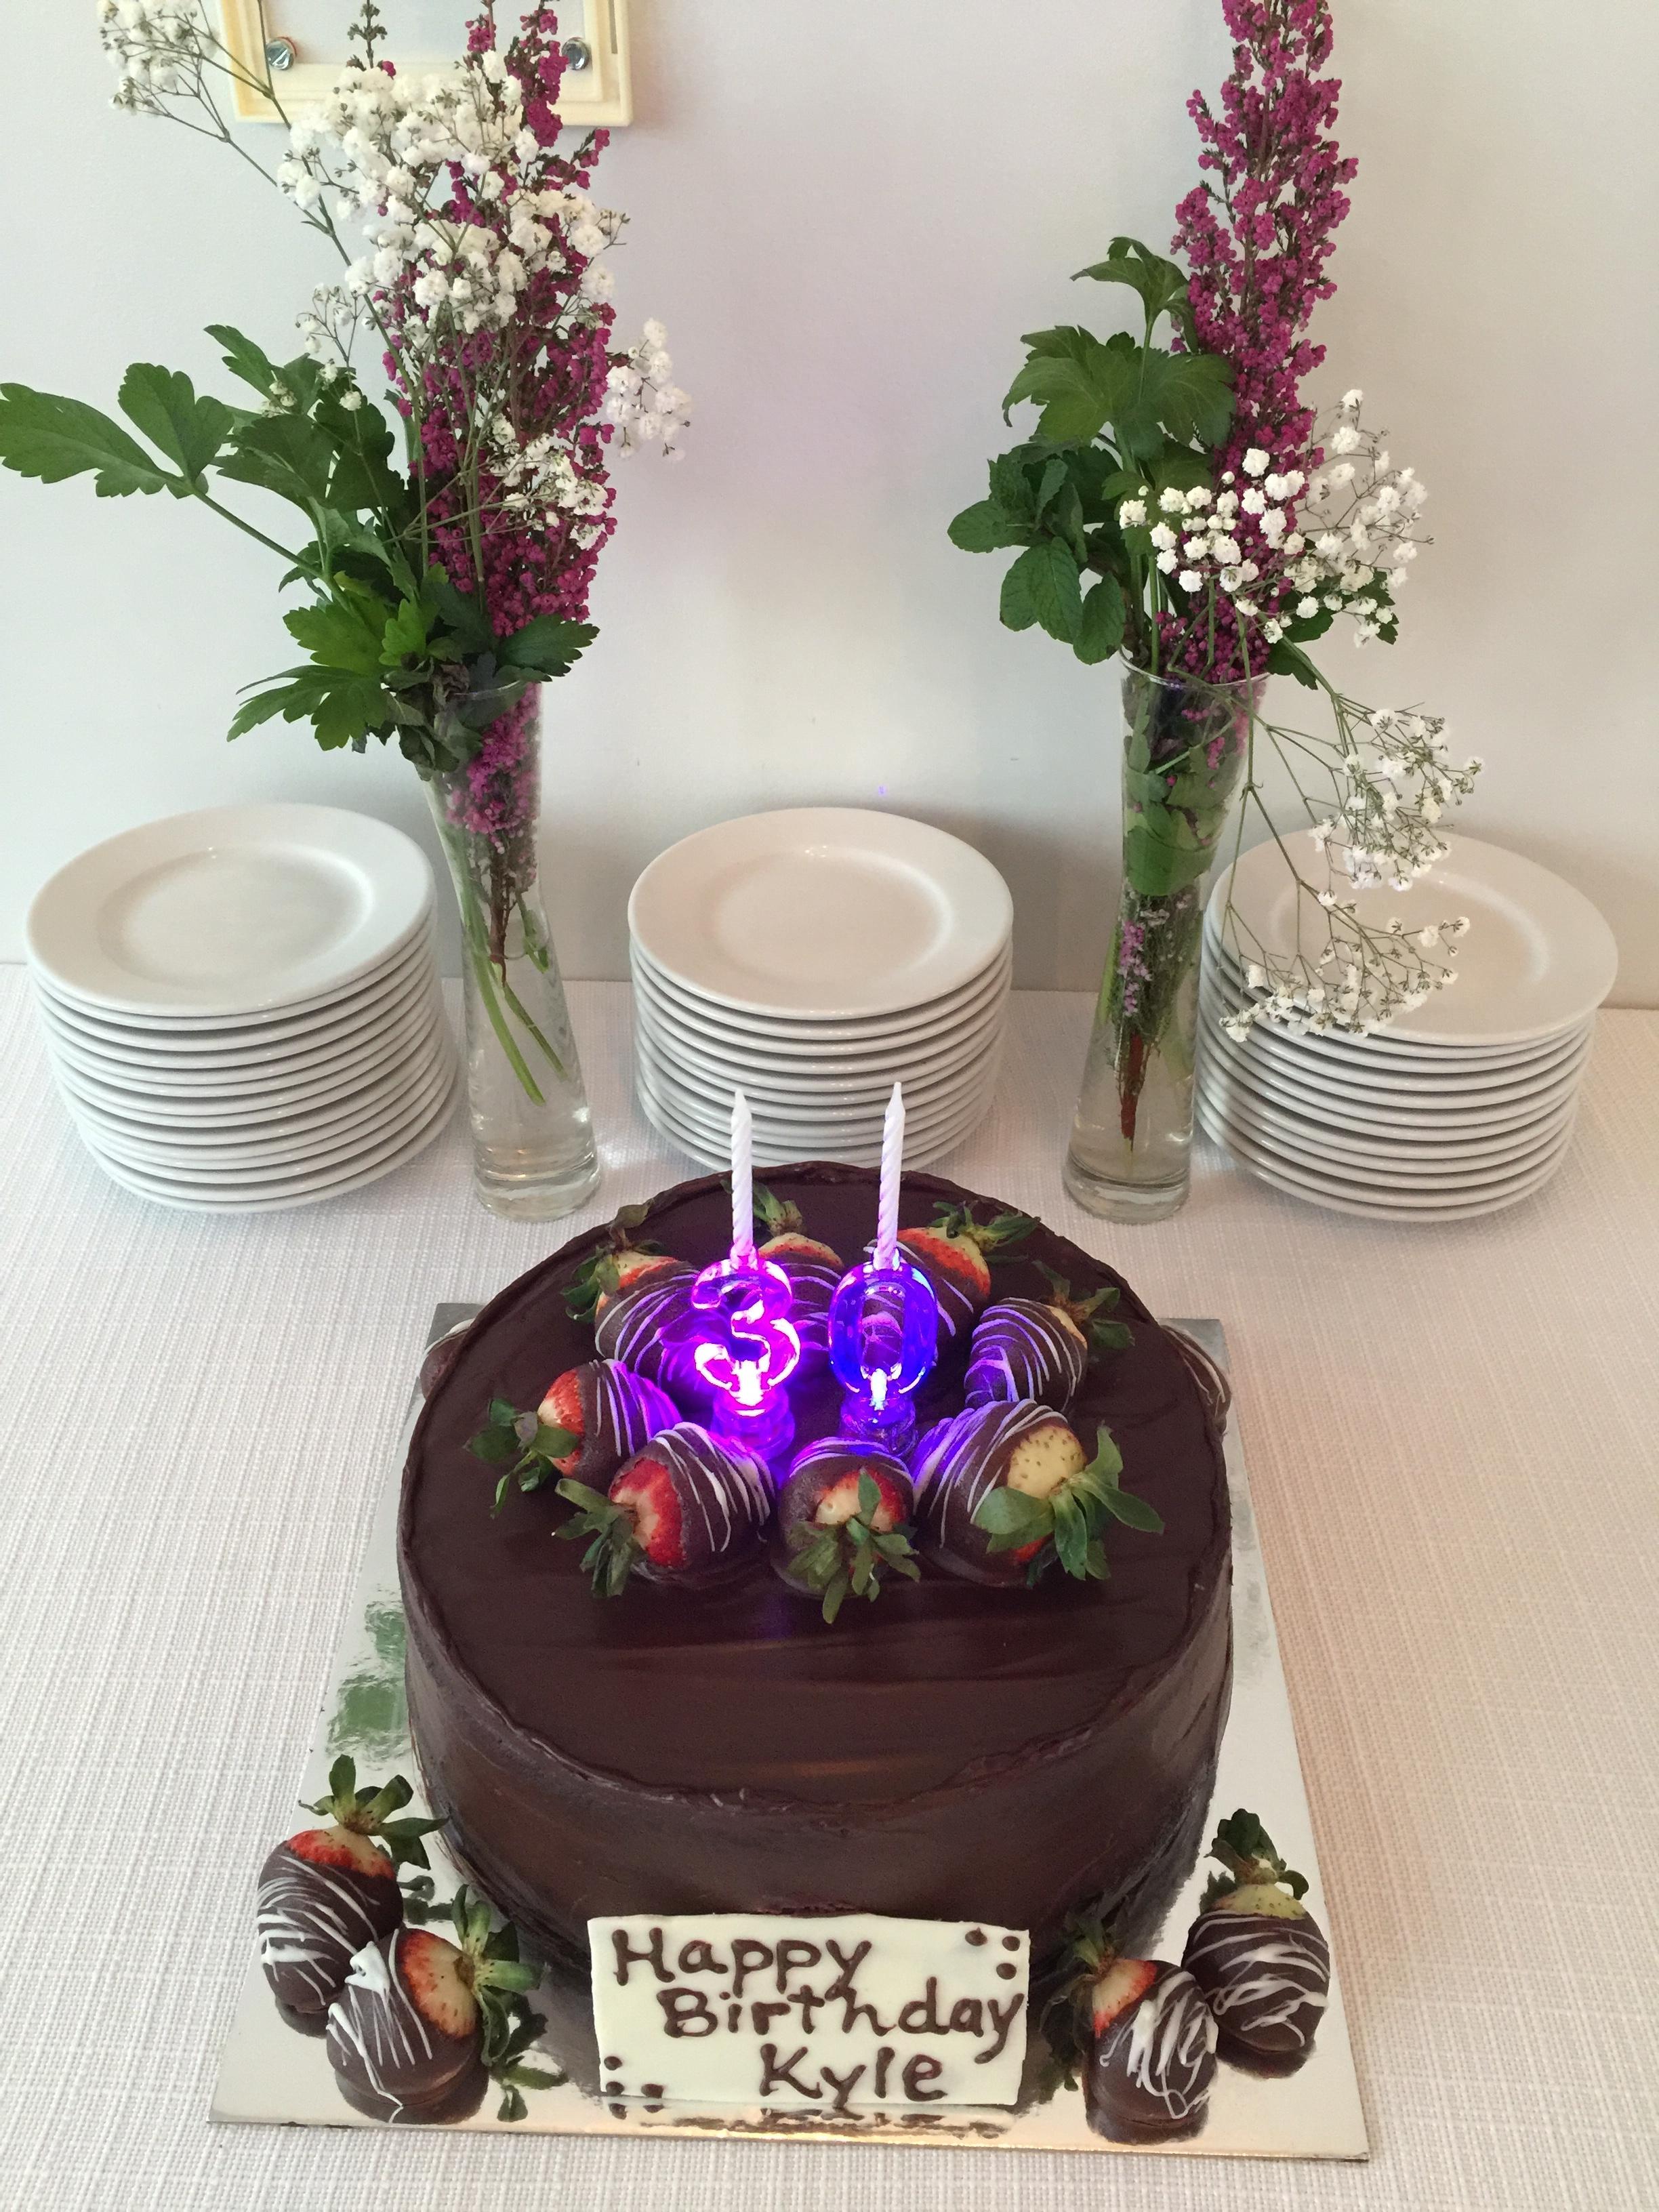 Dirt y 30 cake